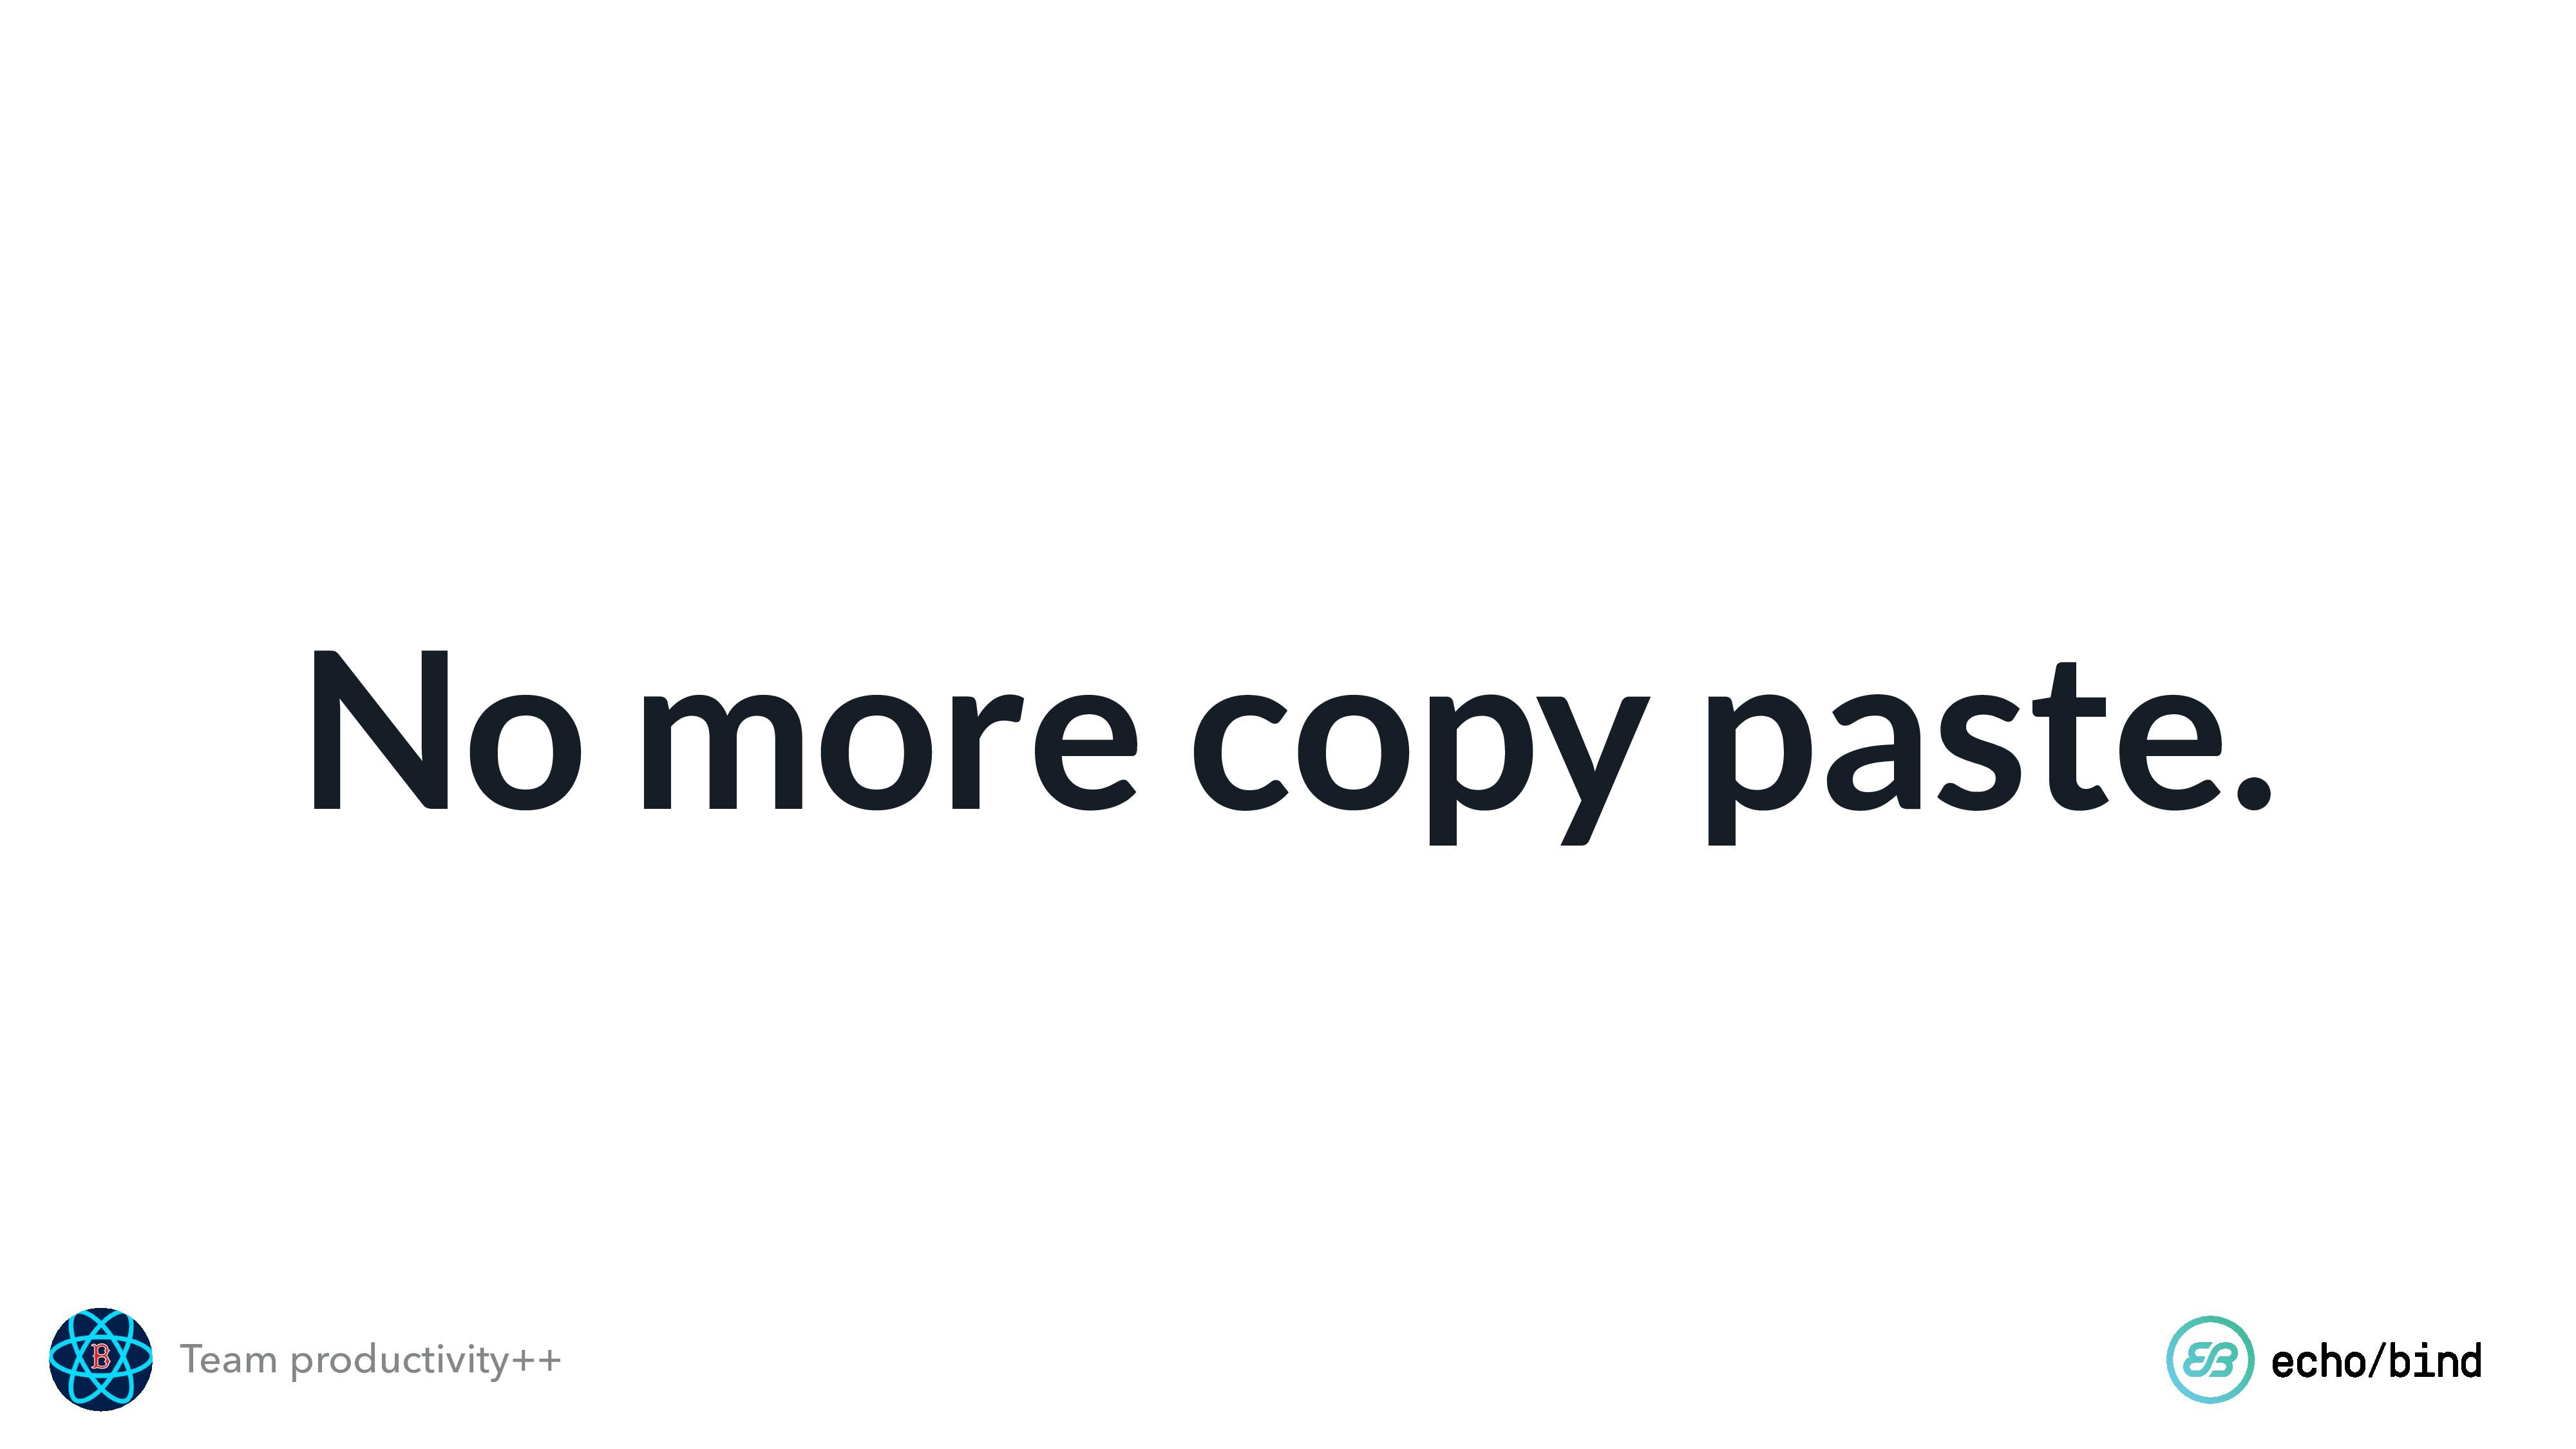 Team productivity++ No more copy paste.